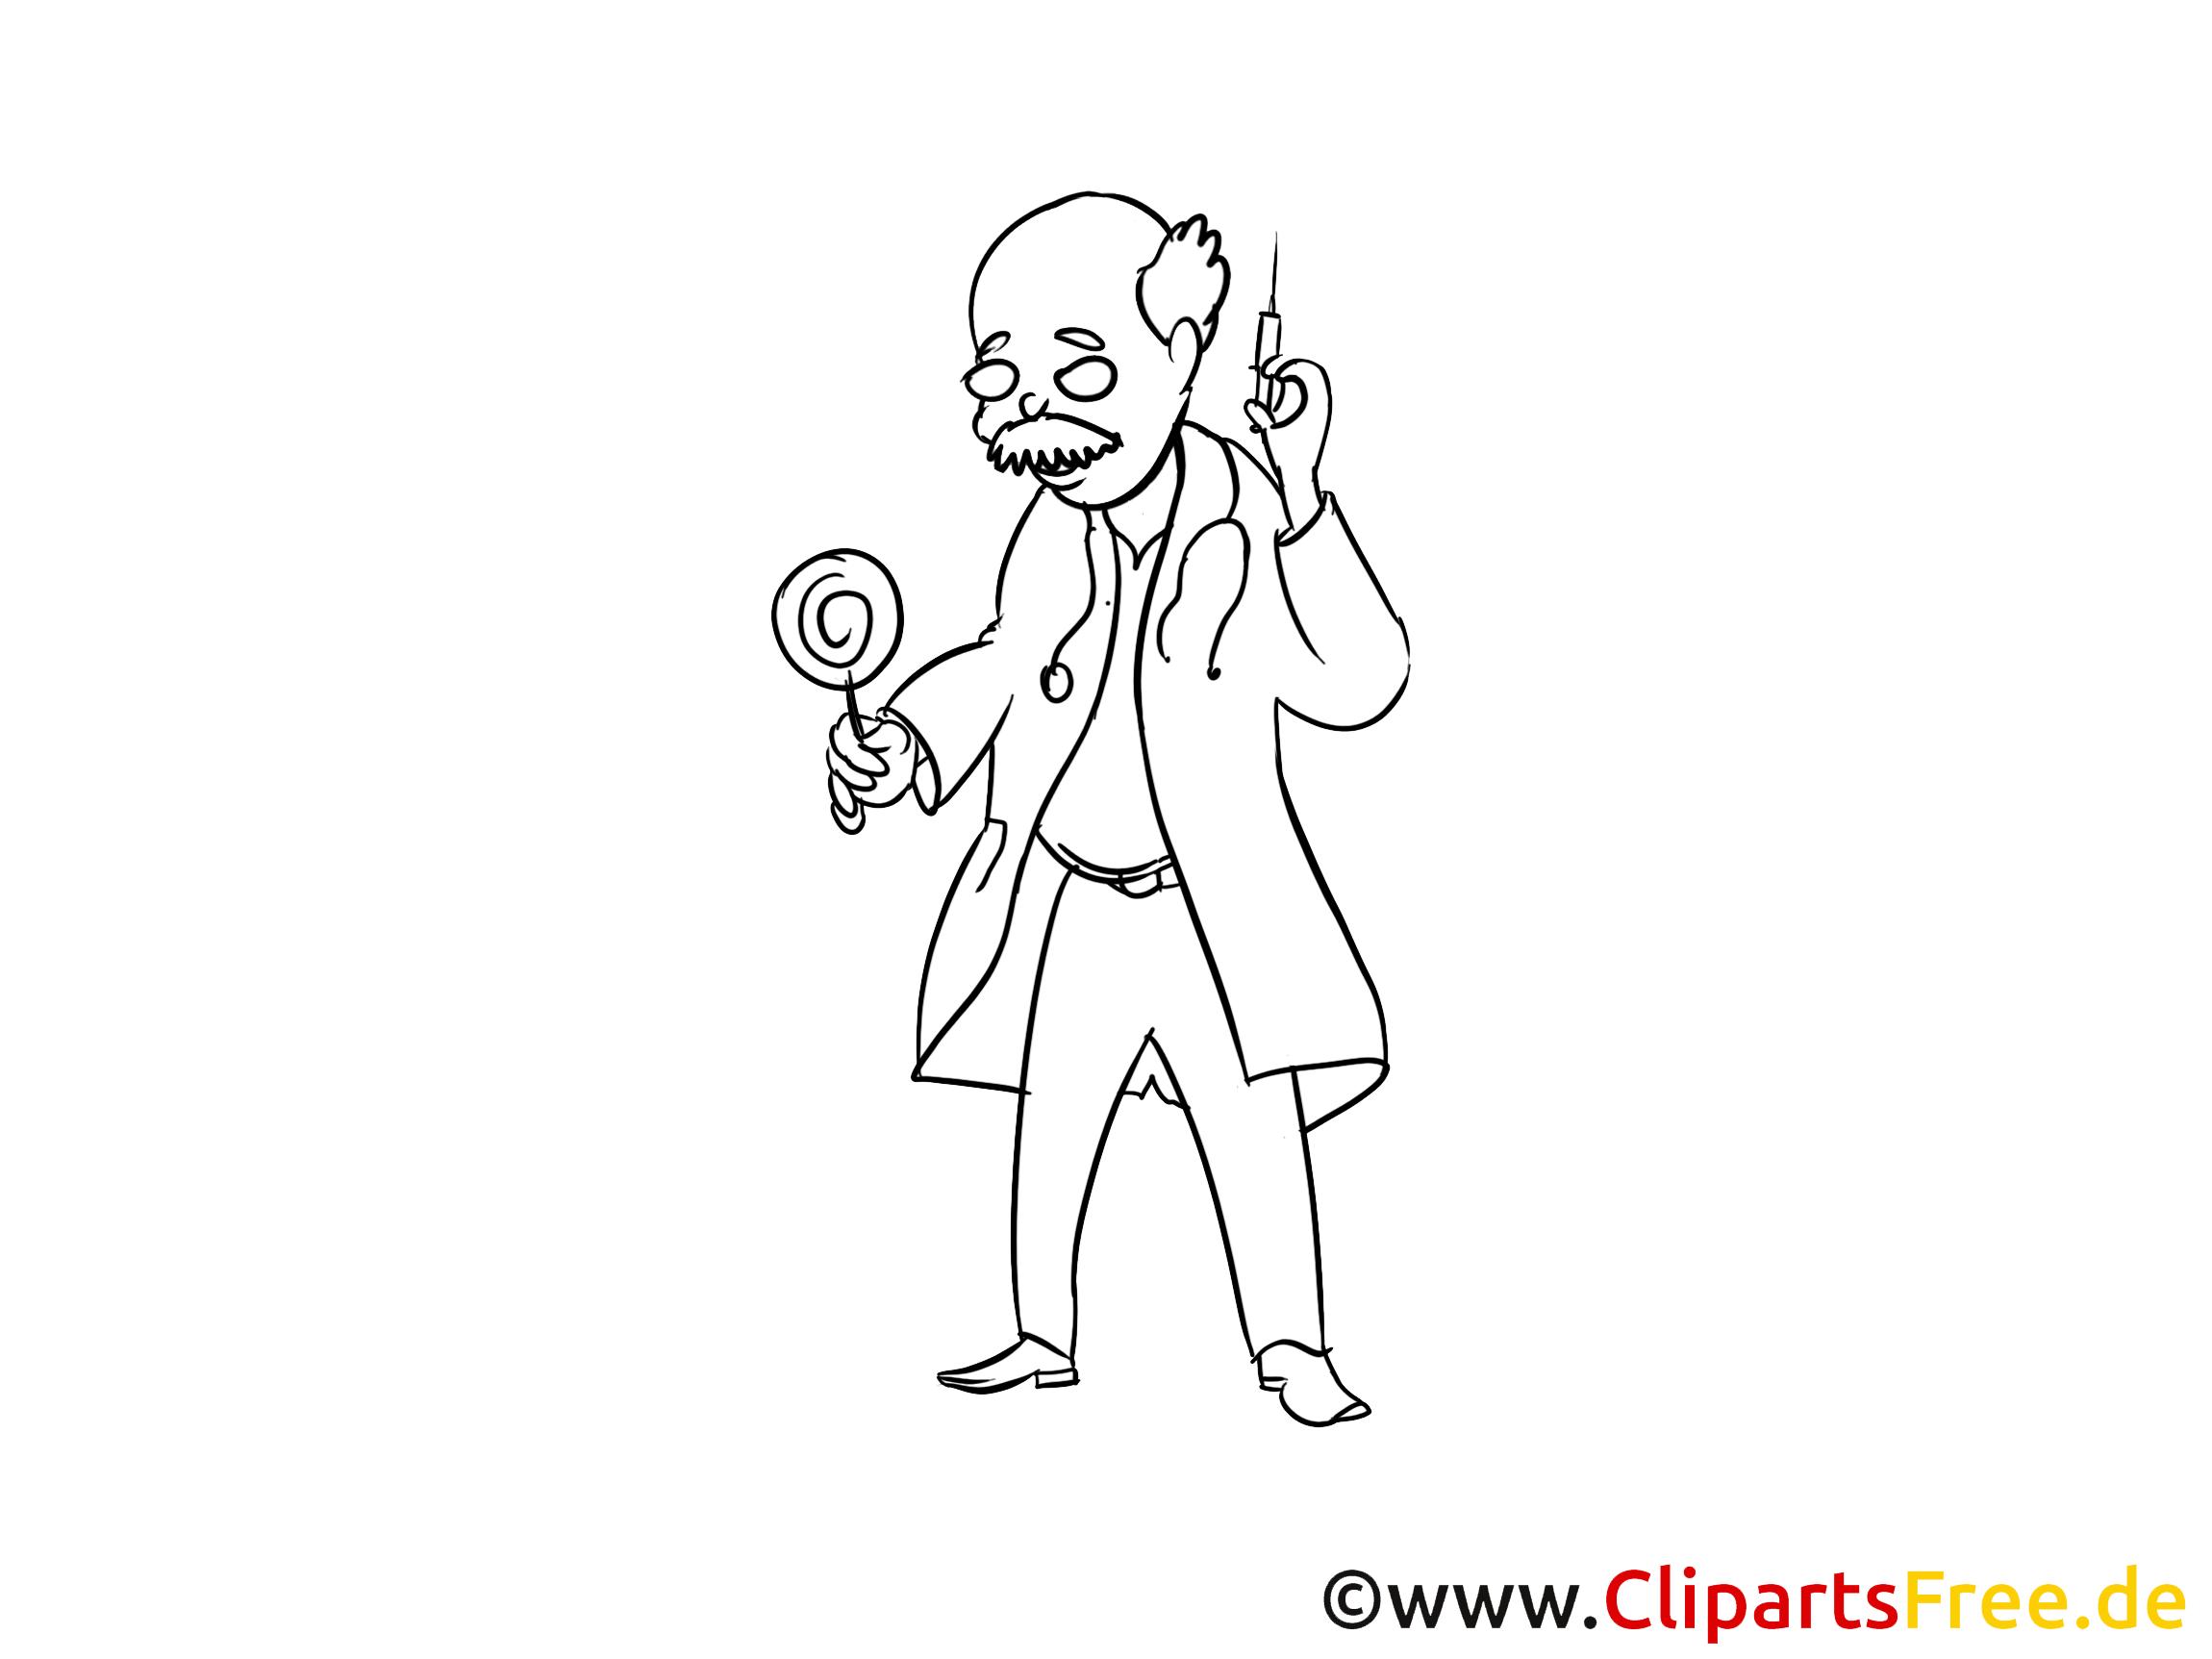 Erfahrener Arzt Zecihnung, Clipart, Bild, Cartoon